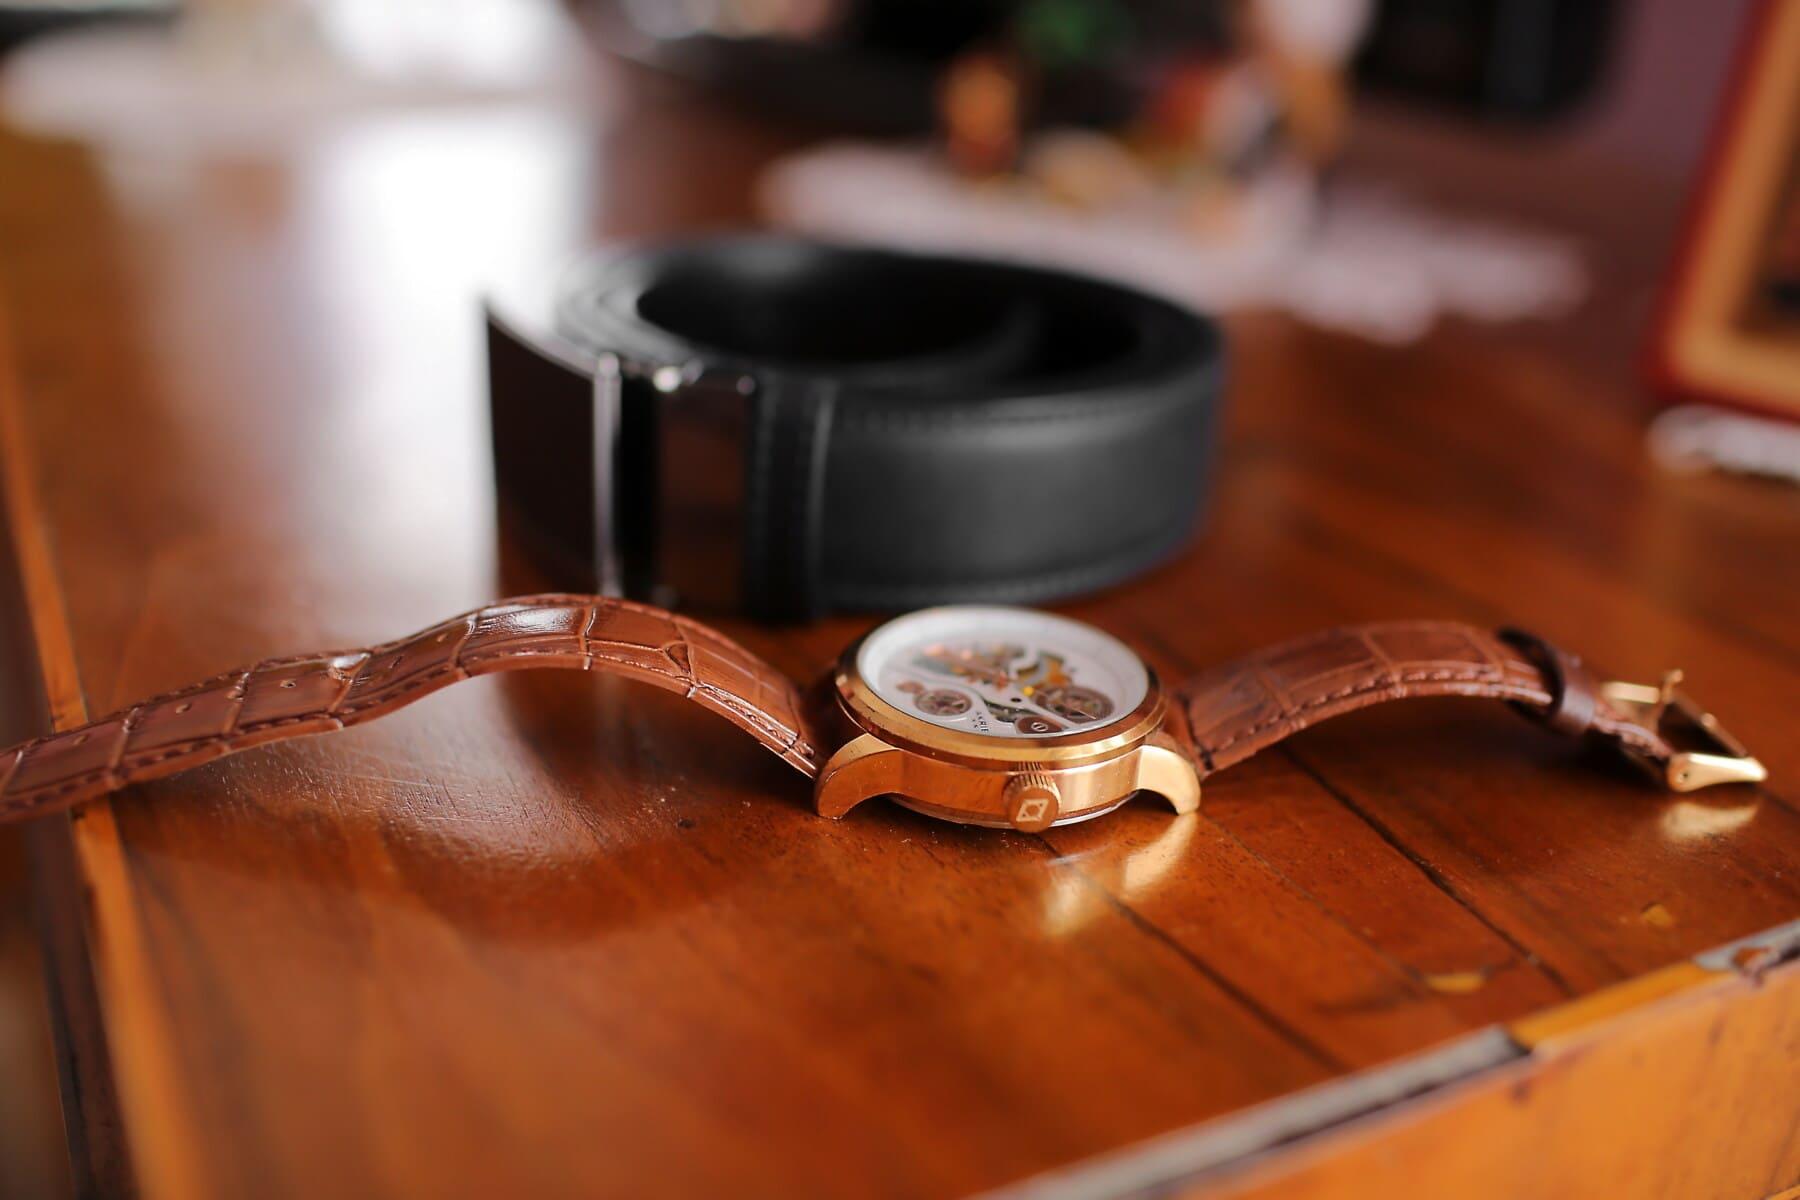 gold, analog clock, belt, leather, wood, still life, indoors, antique, old, retro